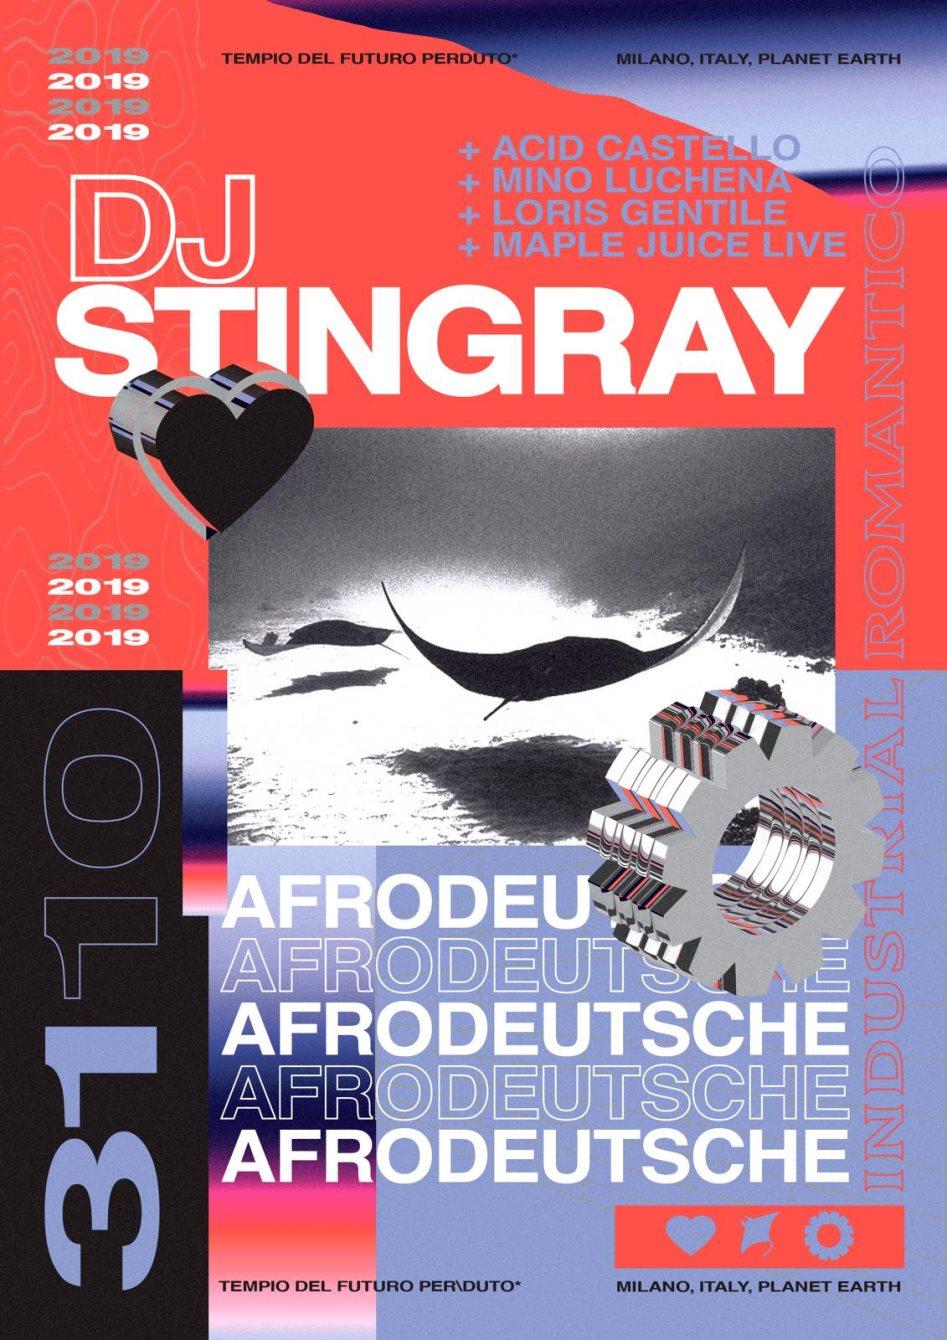 Ra Halloween Romantico Dj Stingray Afrodeutsche